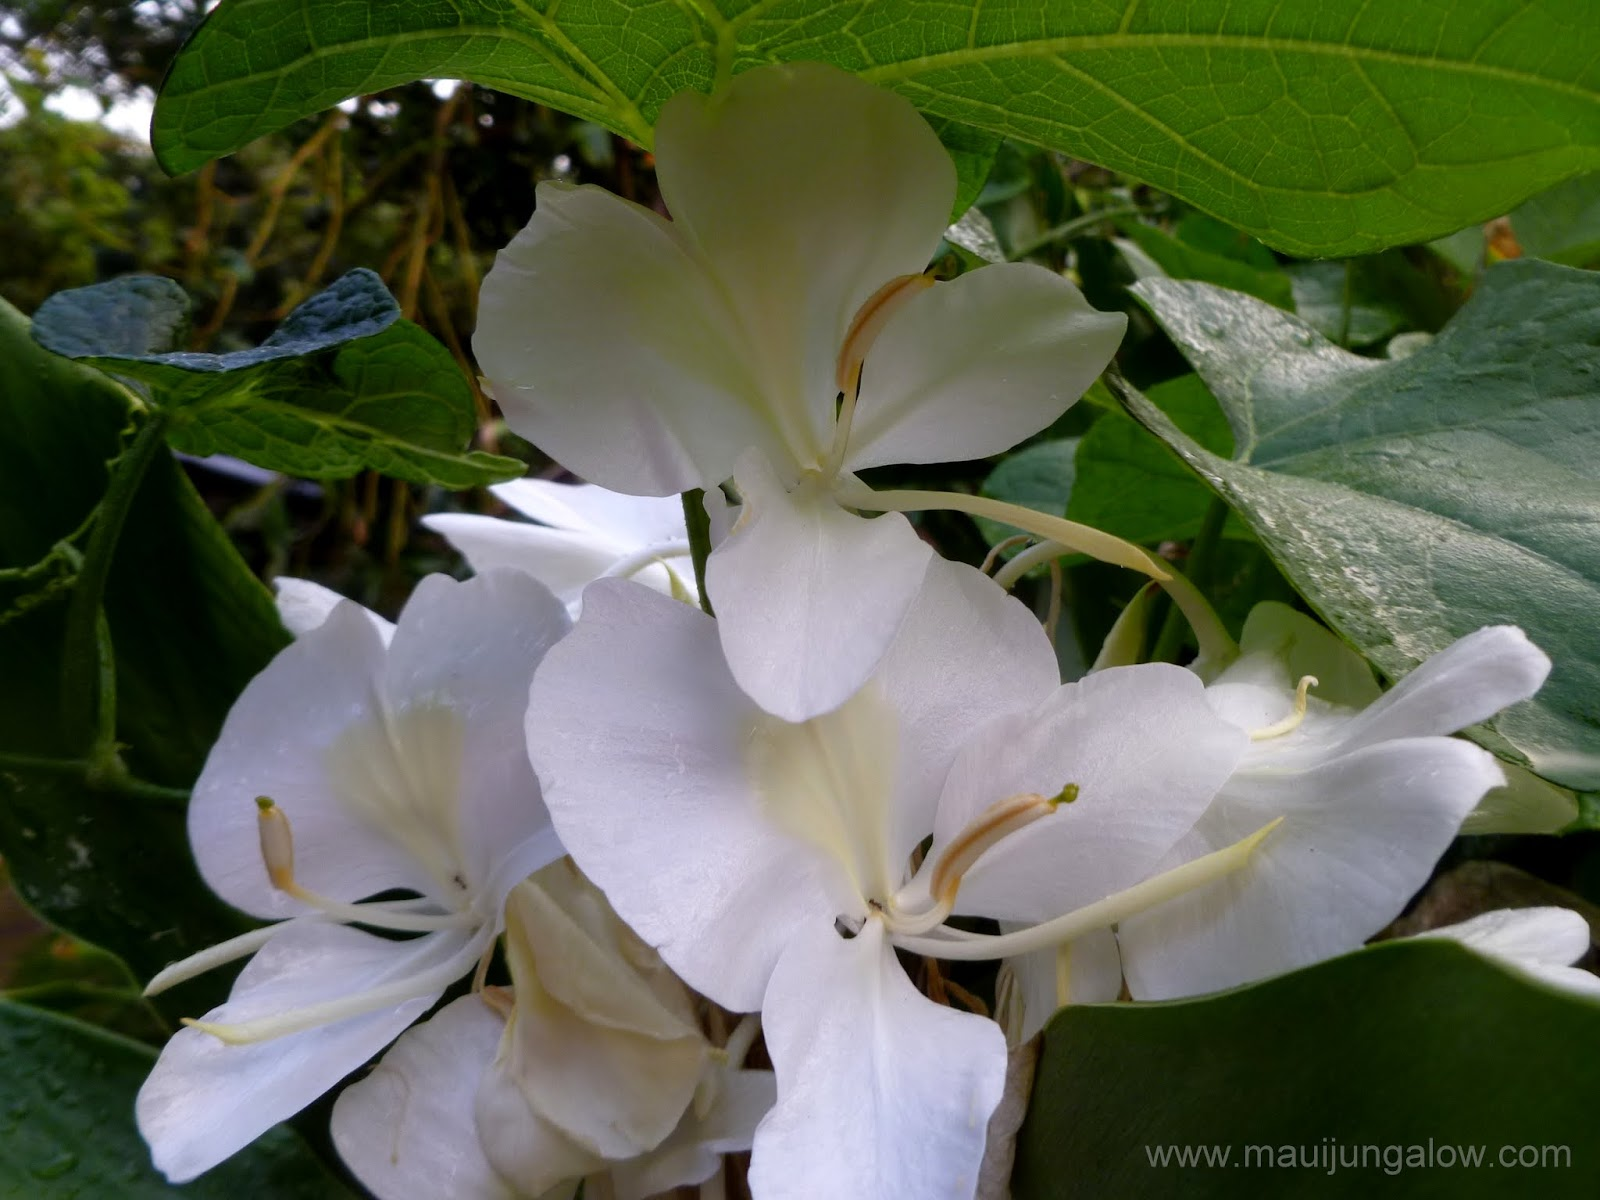 Maui Jungalow Flowering White Ginger